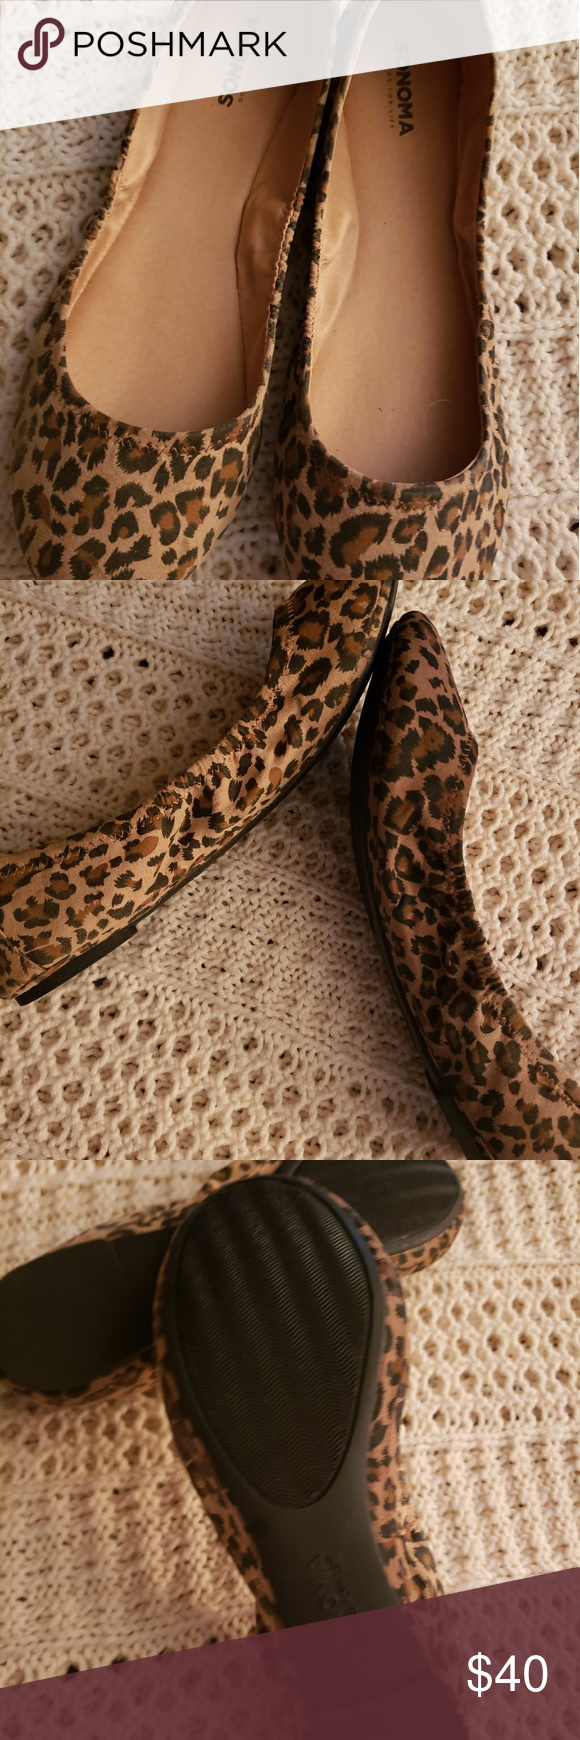 Leopard Loafer Fashion